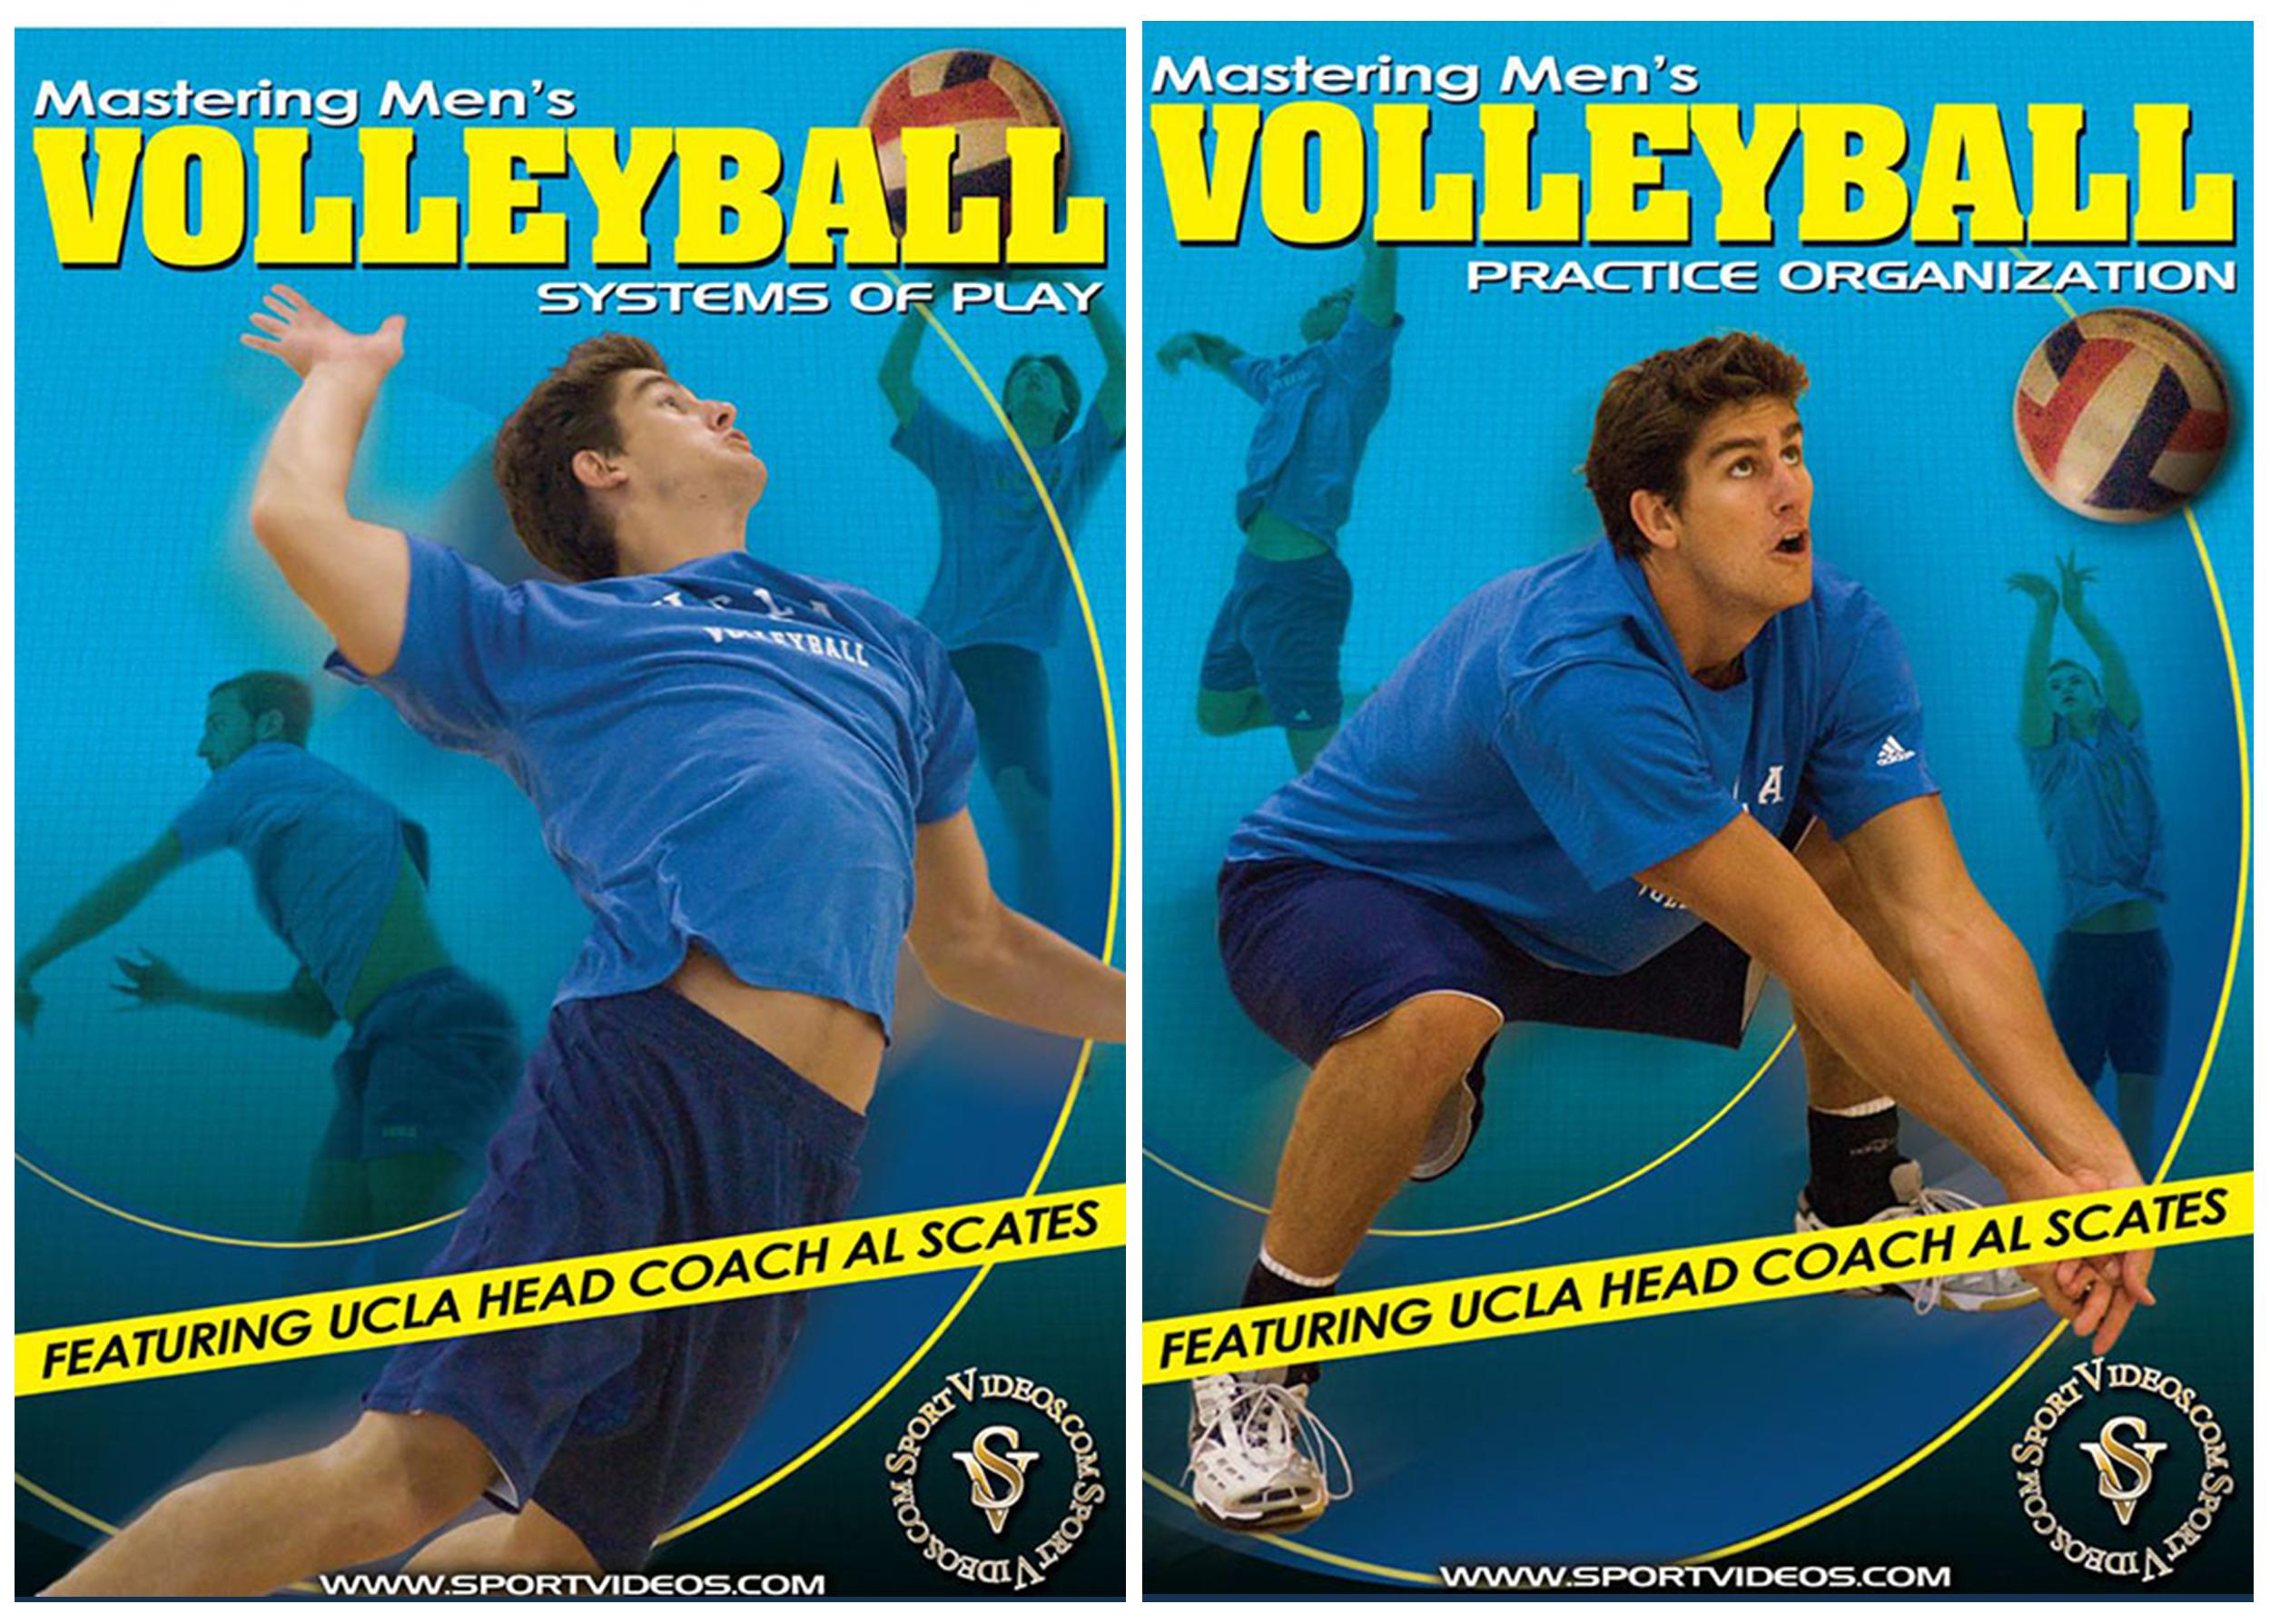 Mastering Men's Volleyball 2 DVD Set